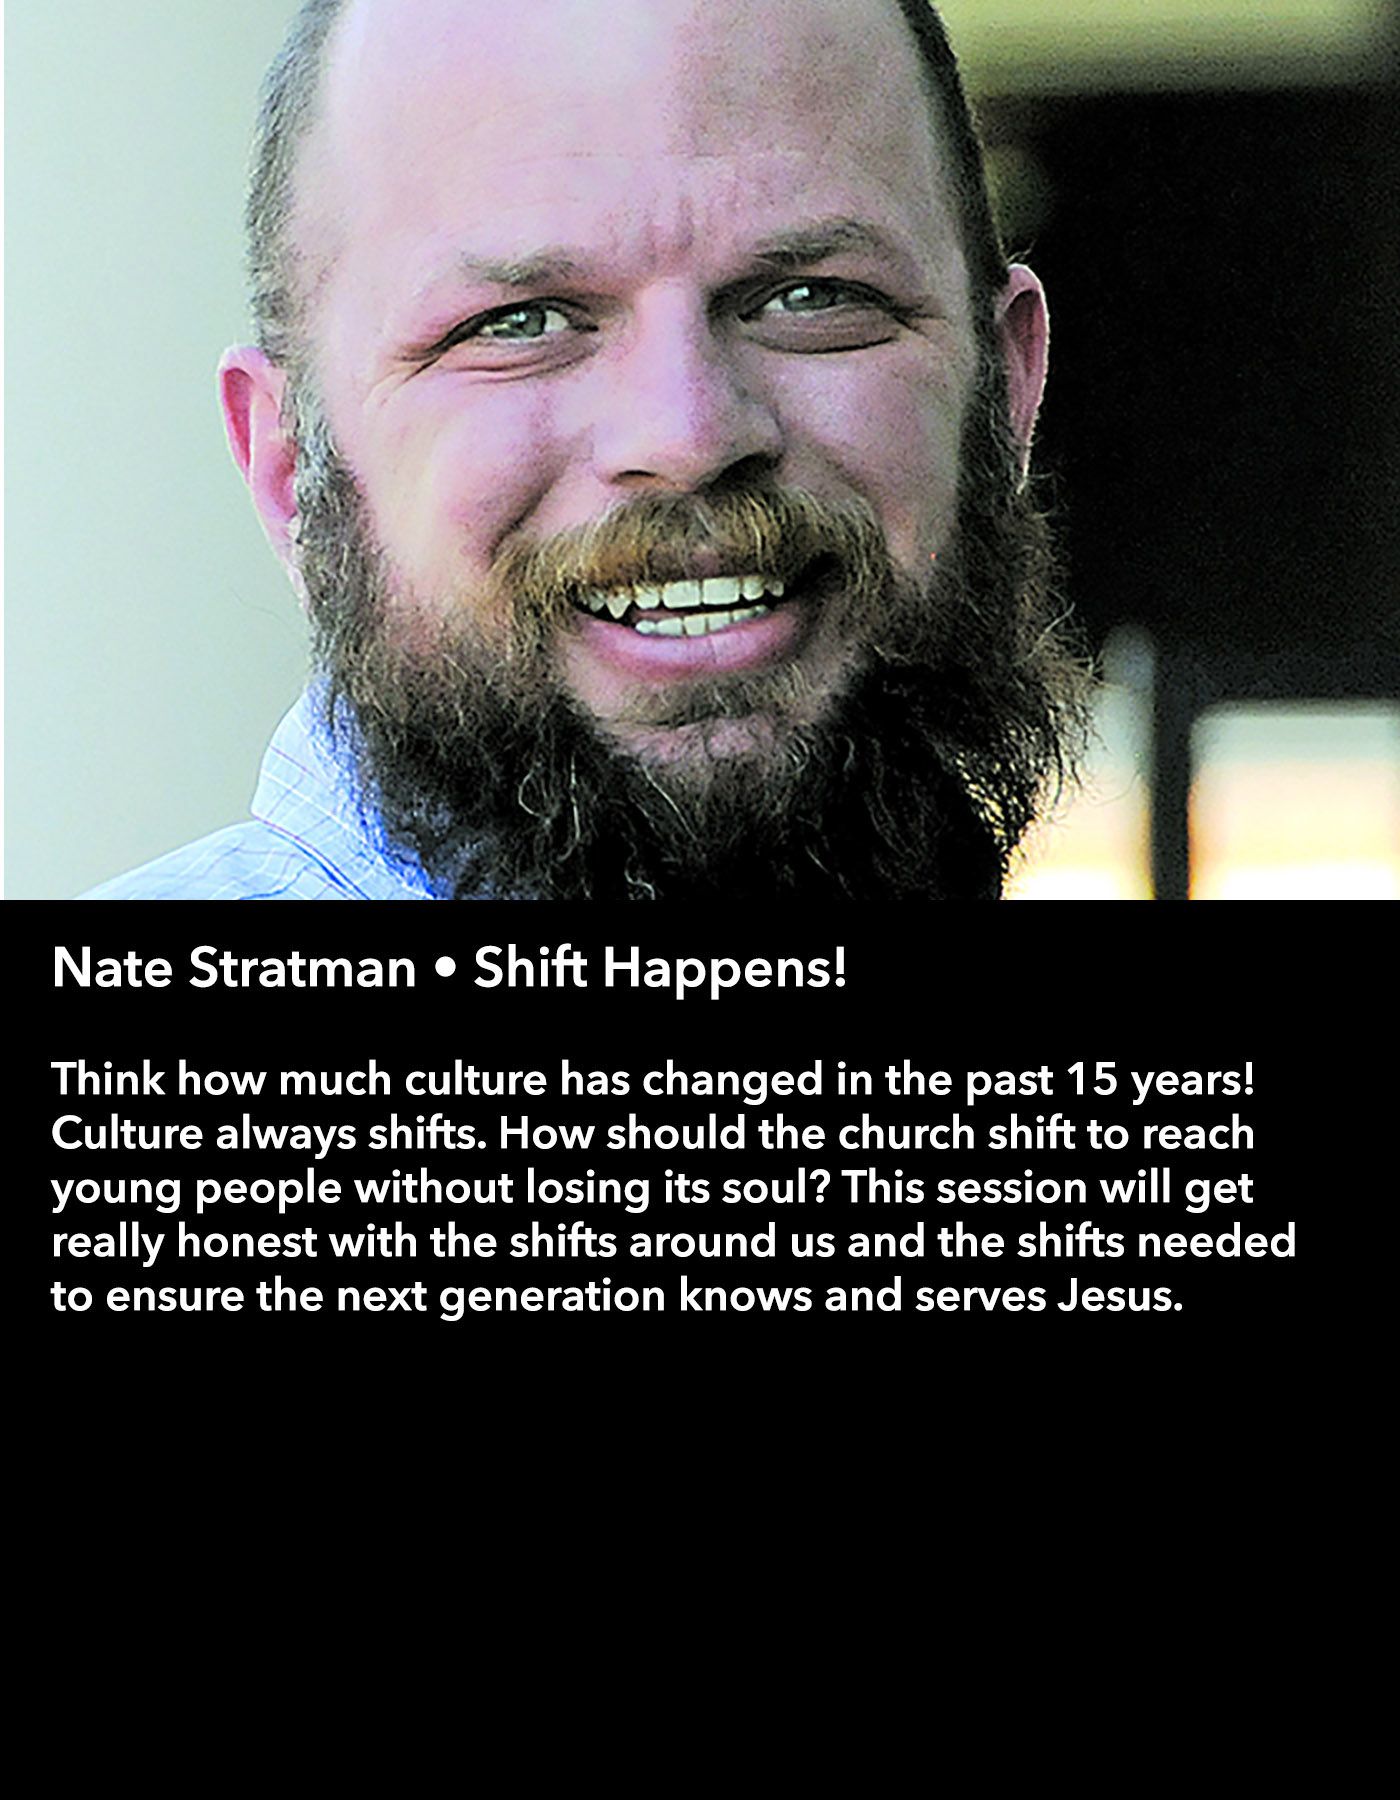 Nate Stratman • Shift Happens! • Saturday Morning, March 18 • 10:30 – 11:45 am